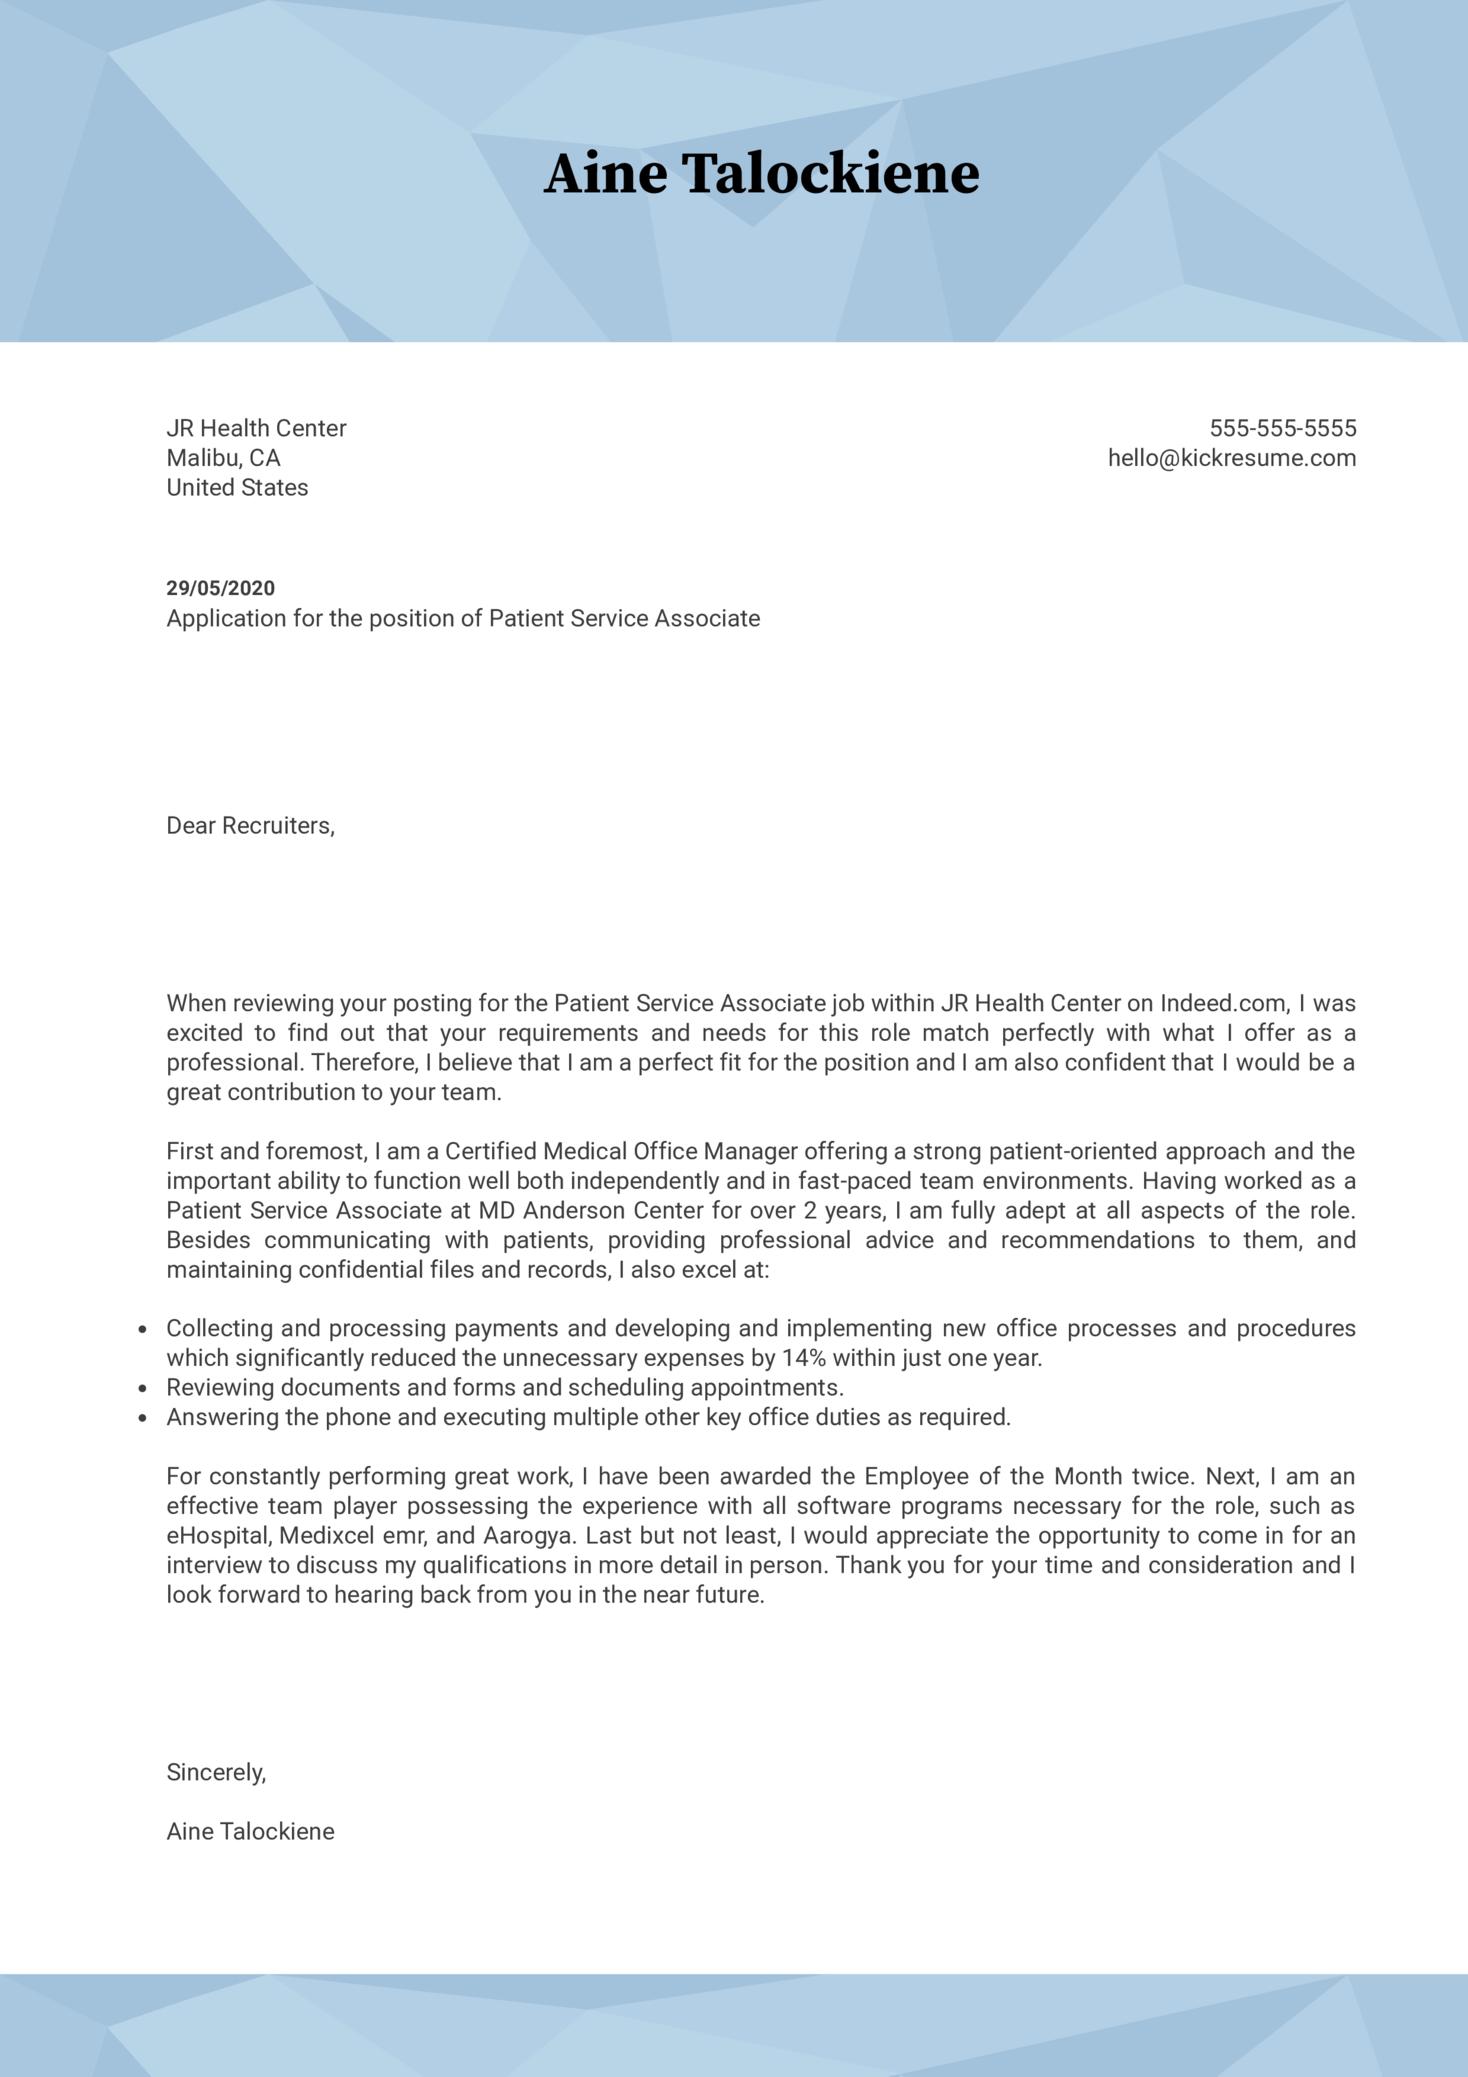 Patient Service Associate Cover Letter Example